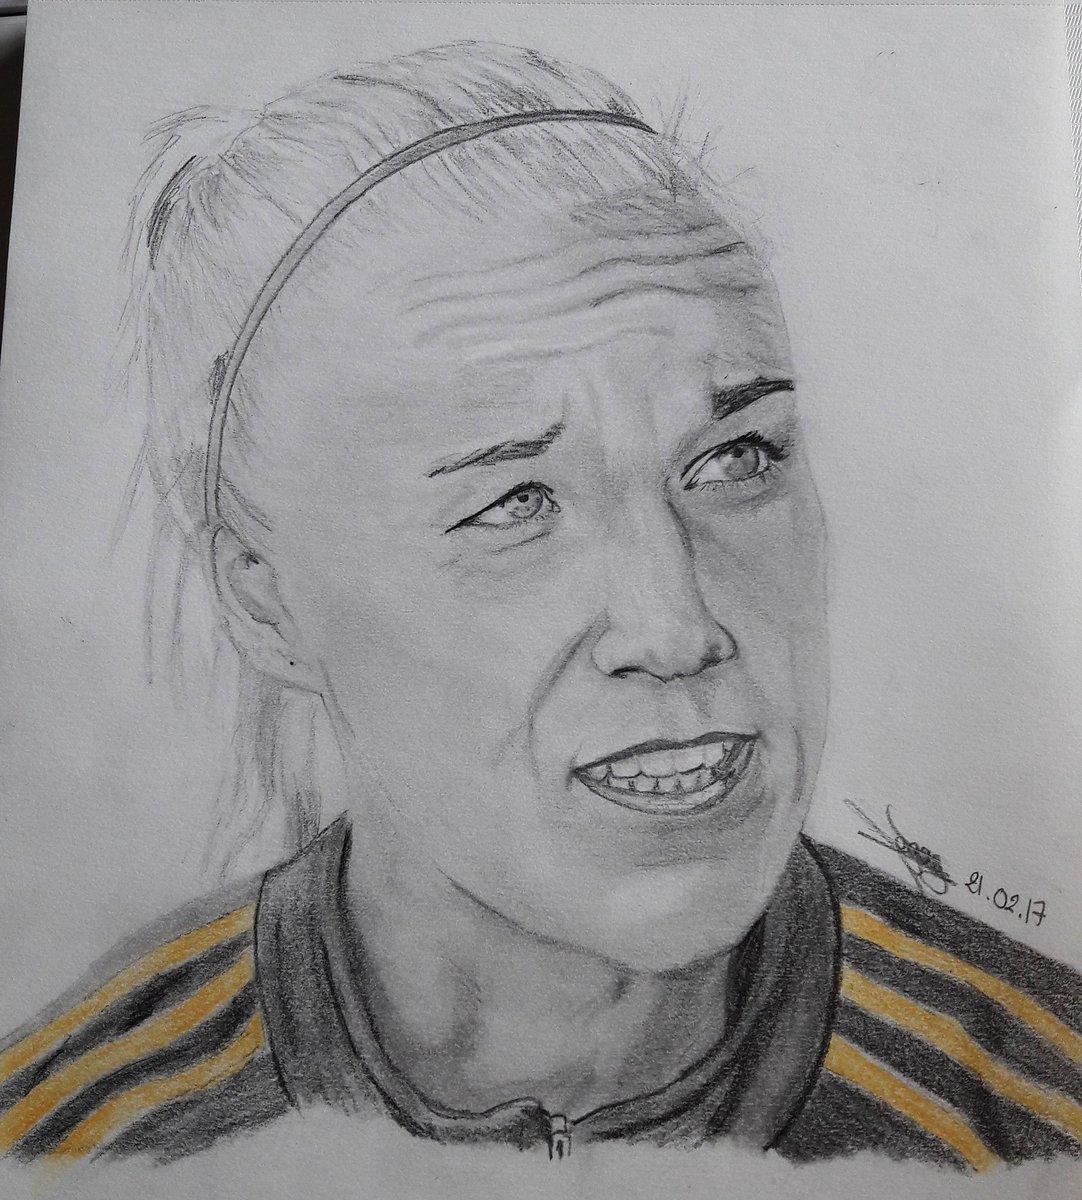 Portrait de @Cseger9 !!!  #carolineseger #olfeminin #sweden #midfielder #soccer #drawing #portrait #passion<br>http://pic.twitter.com/thzccxUcEy